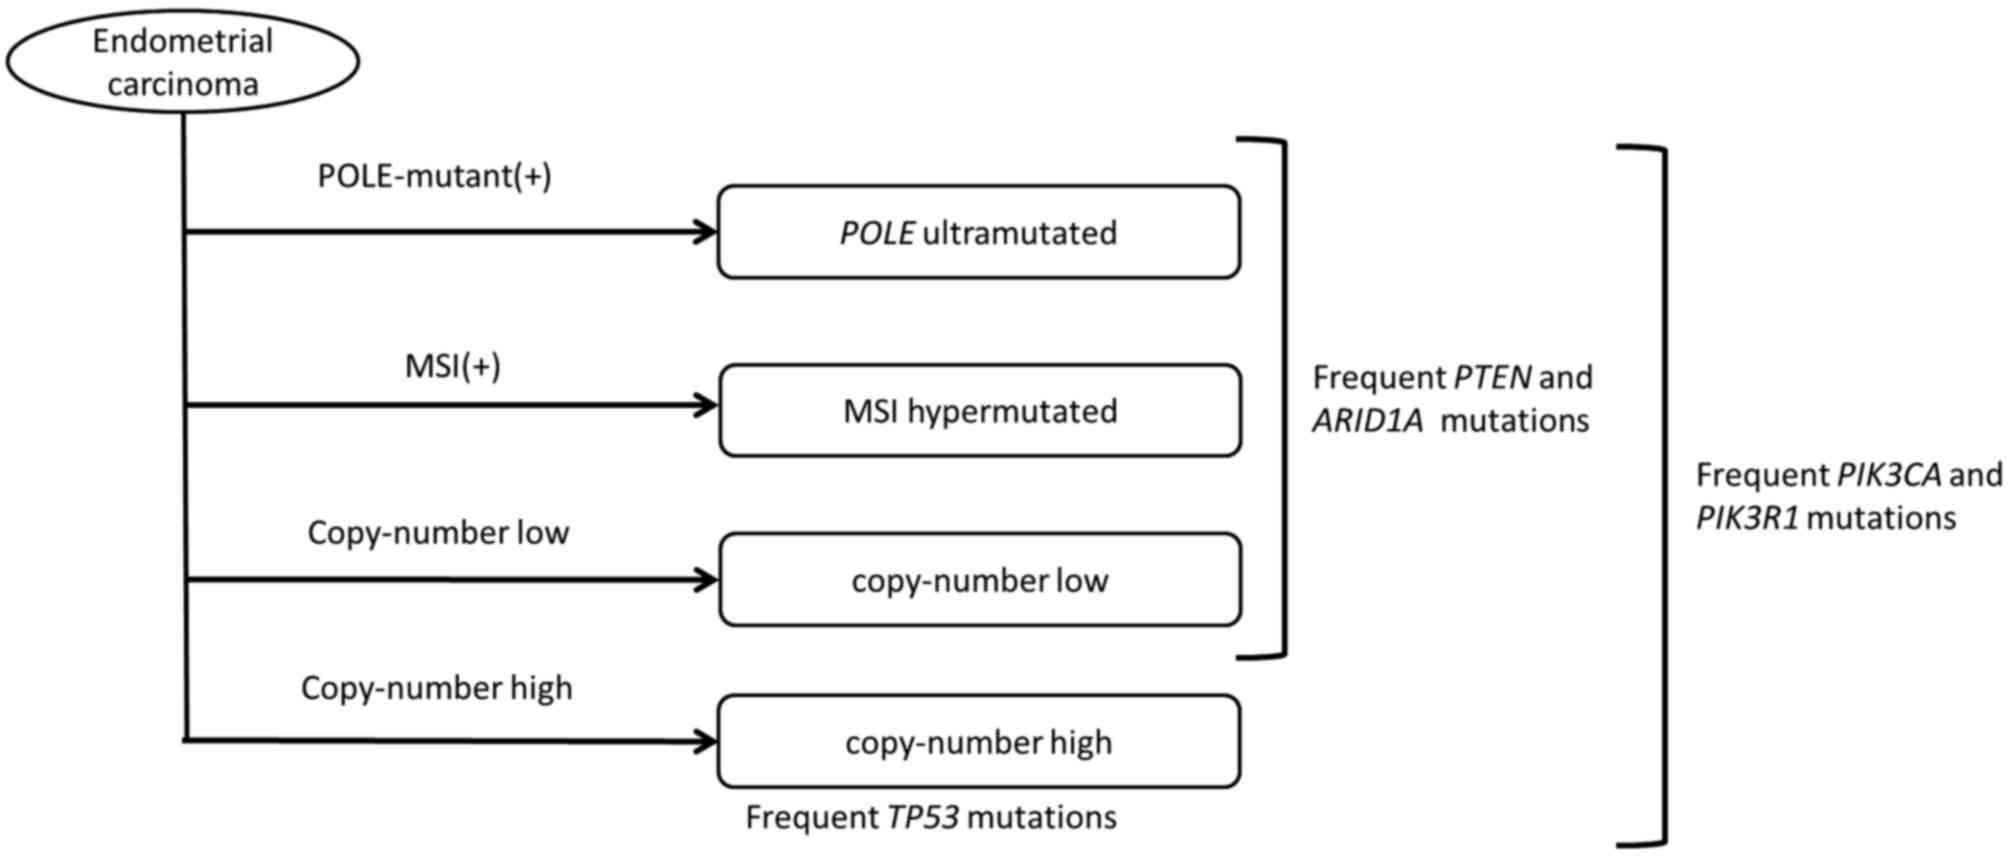 Evoluția hiperplaziei endometriale la cancer Endometrial cancer microsatellite instability